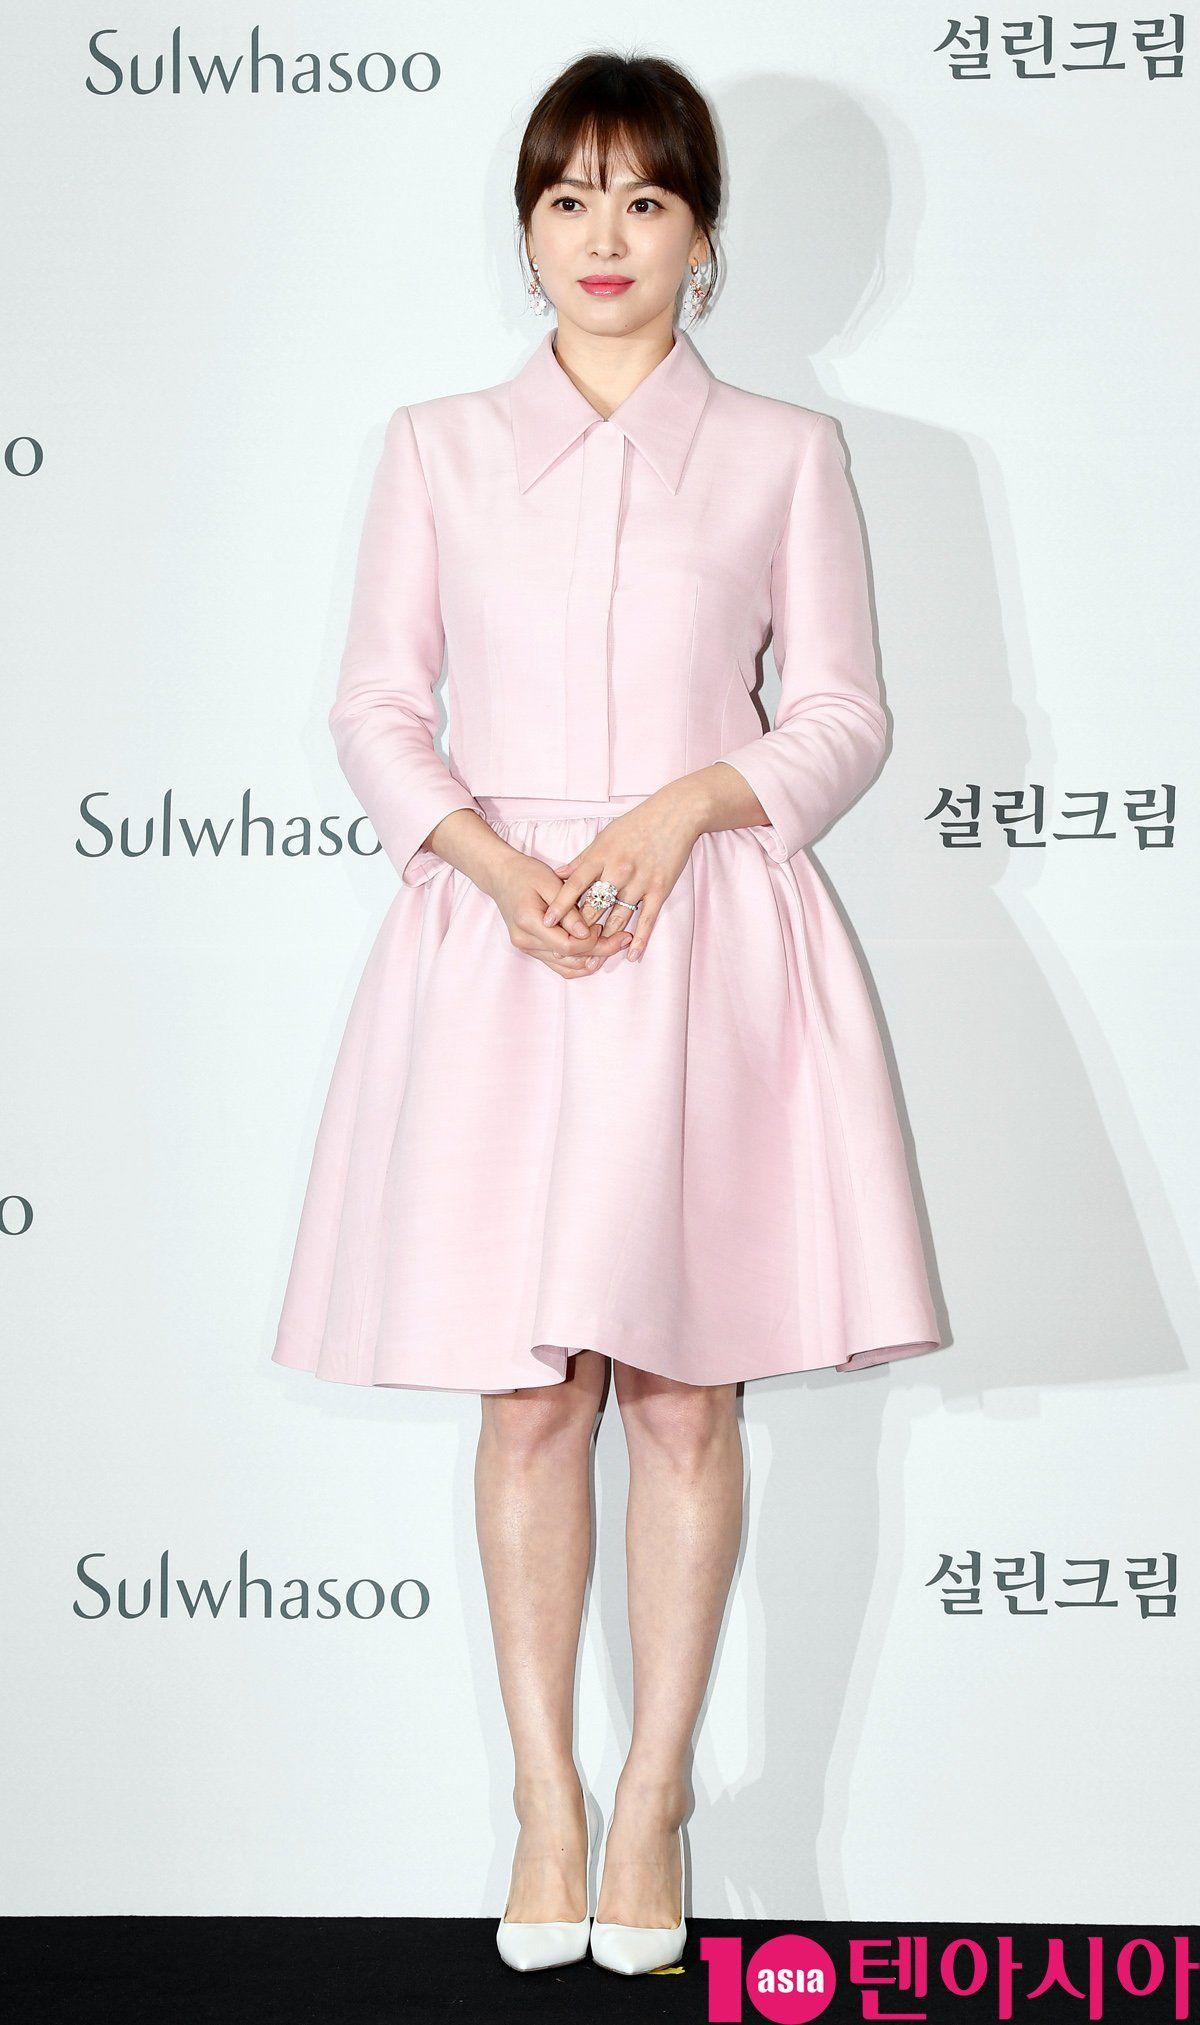 Song hye kyo 2018 (Dengan gambar)